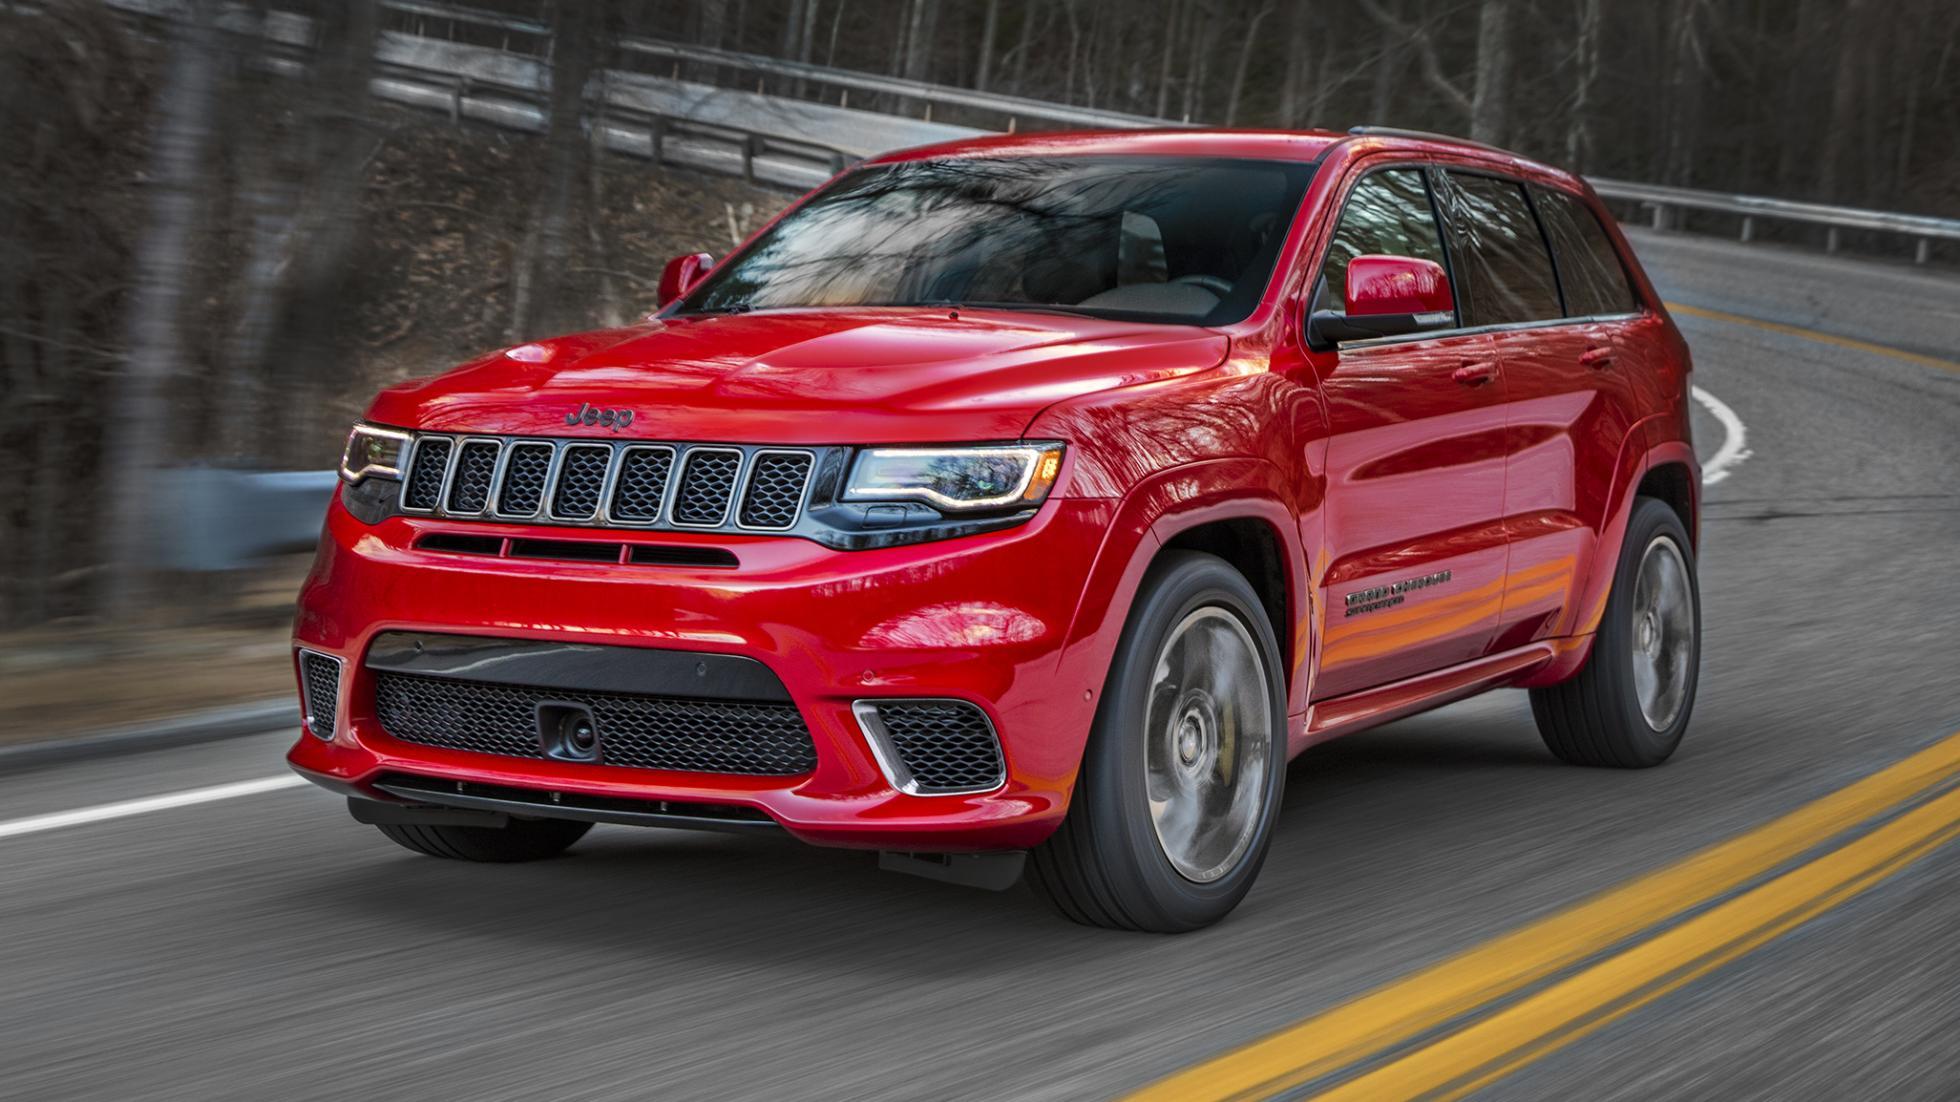 Jeep Grand Cherokee Trackhawk 2017 rood